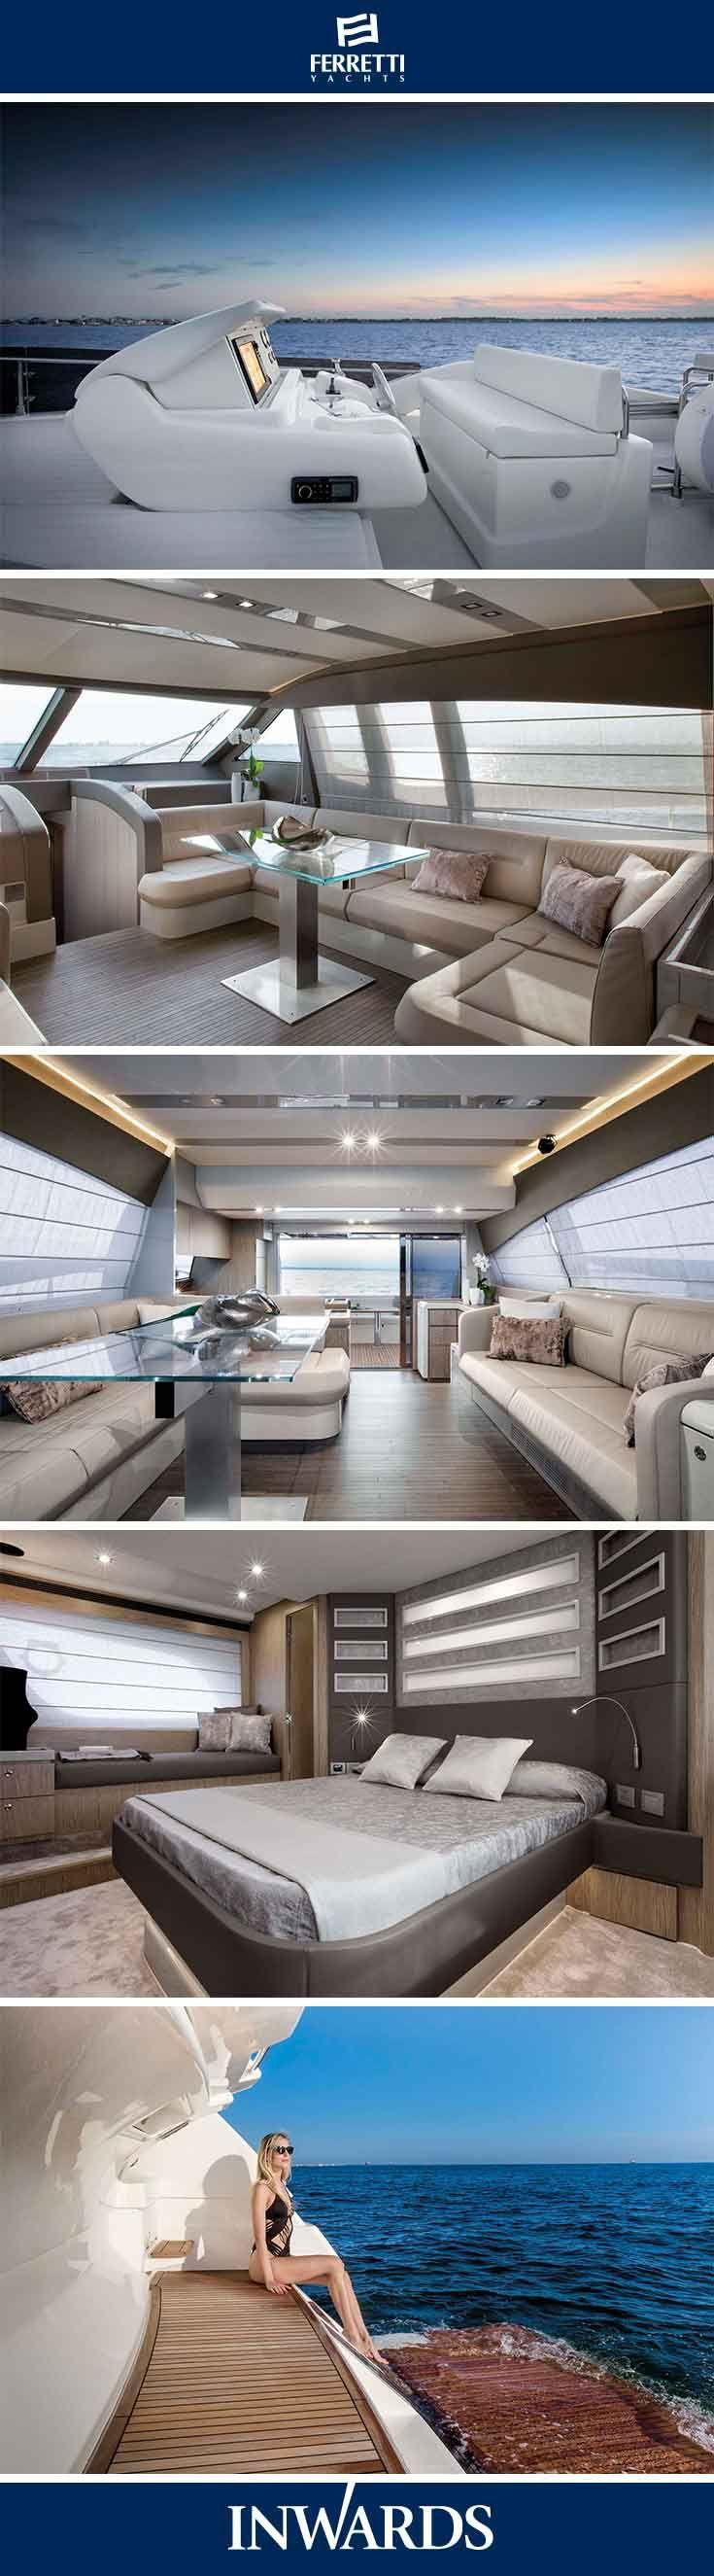 Ferretti Yachts 650 - interior | Stunningly eye catching.